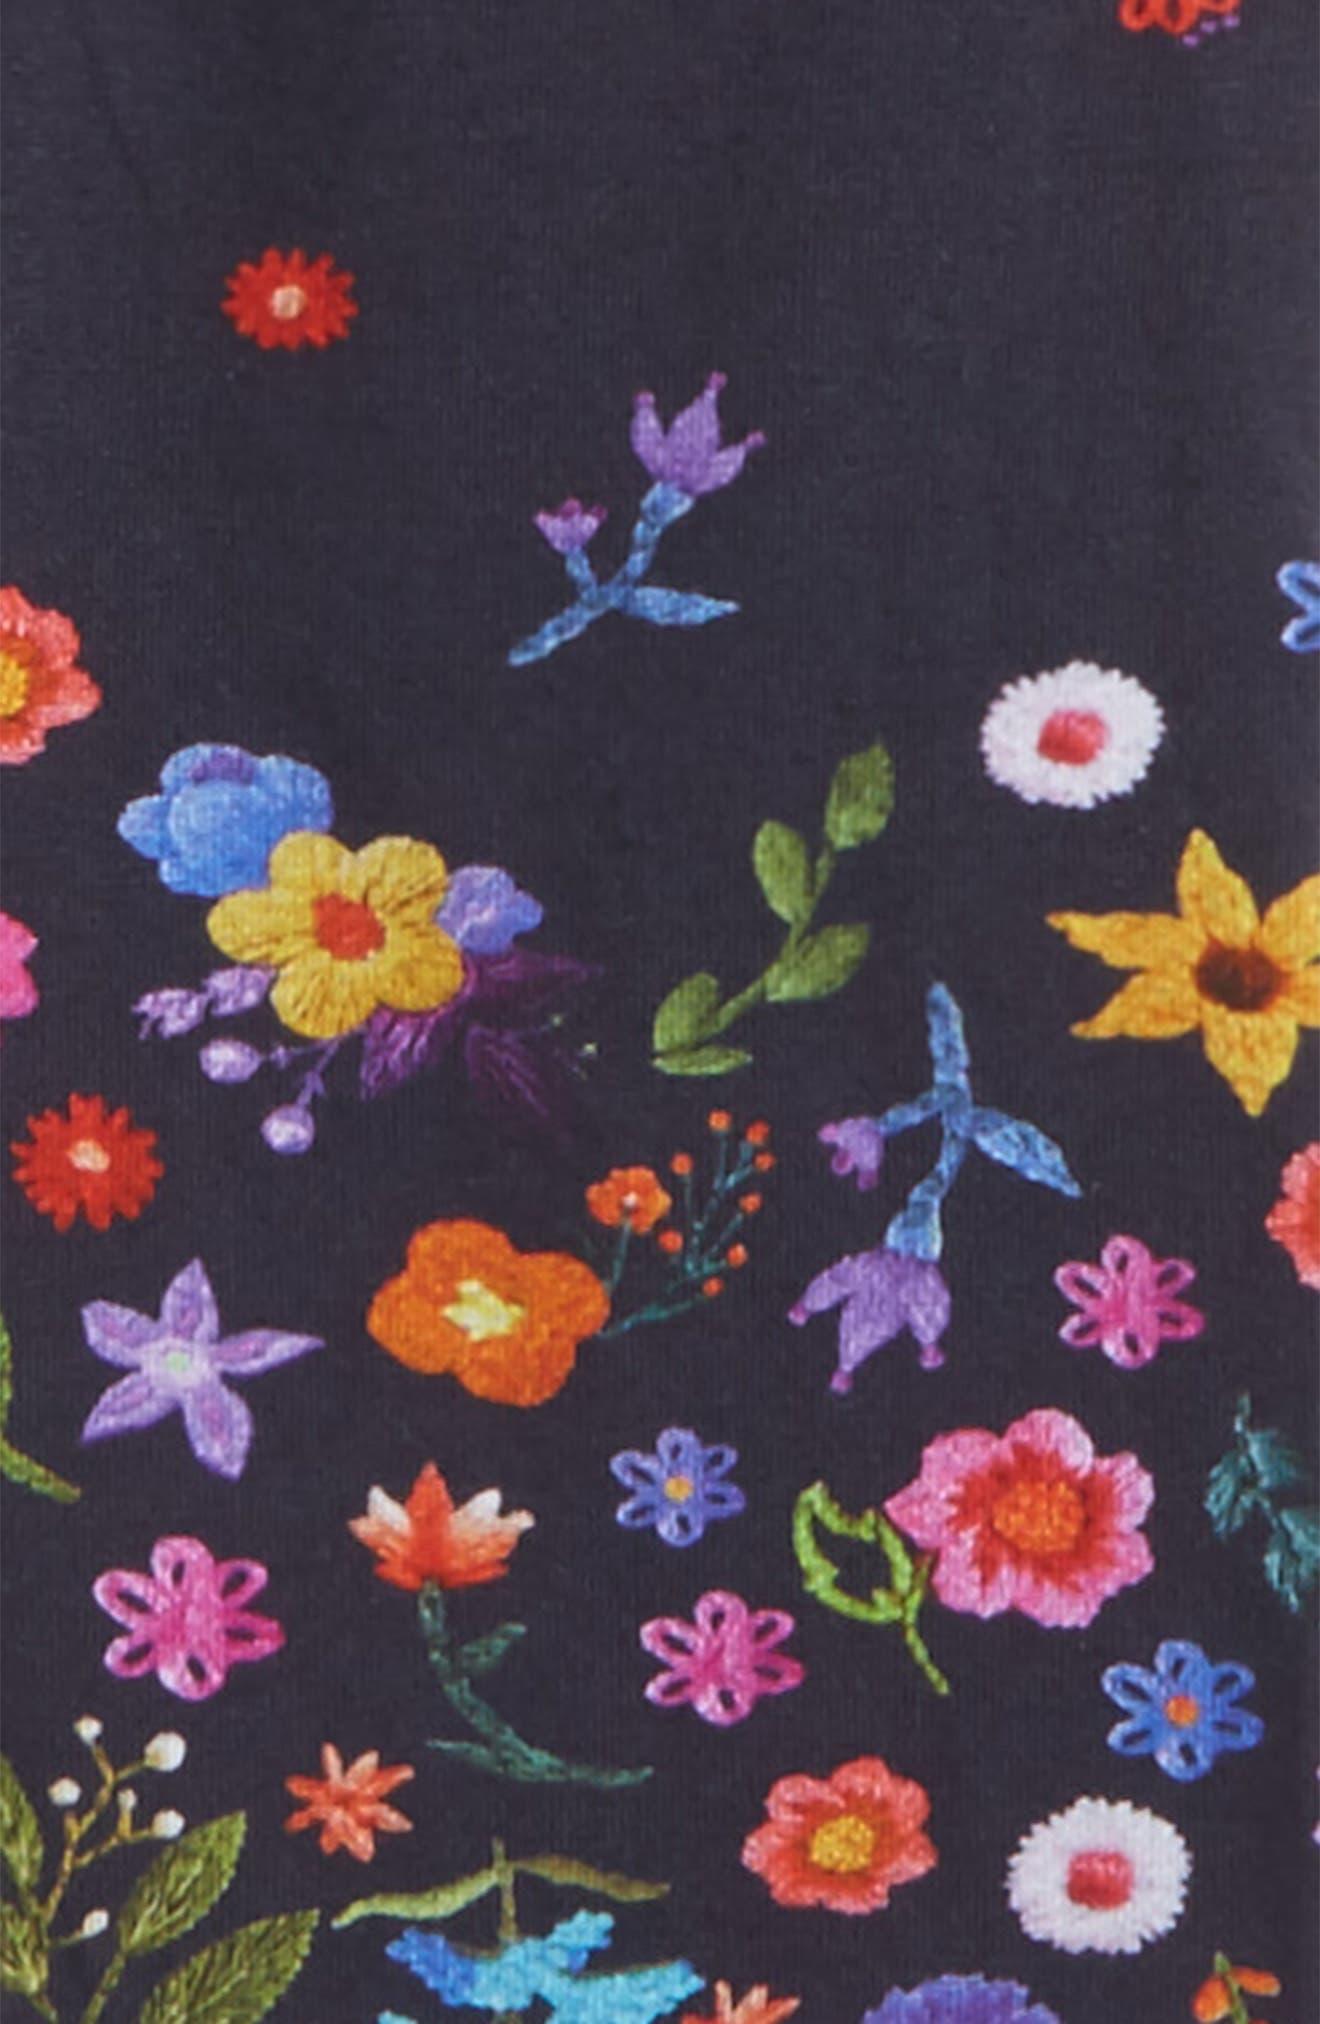 Floral Print Leggings,                             Alternate thumbnail 2, color,